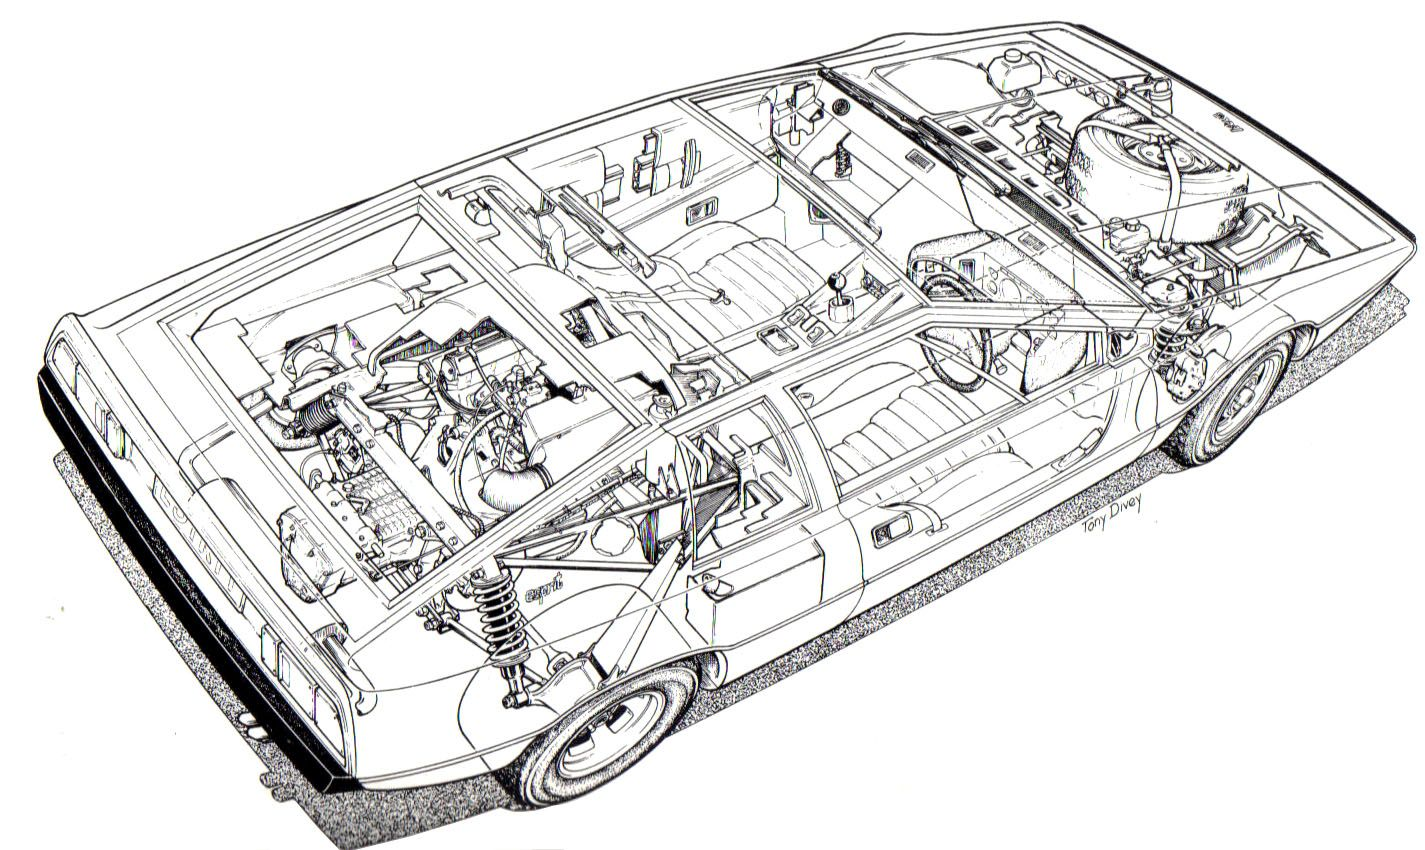 Lotus Esprit Prototype Cutaway Drawing Technical